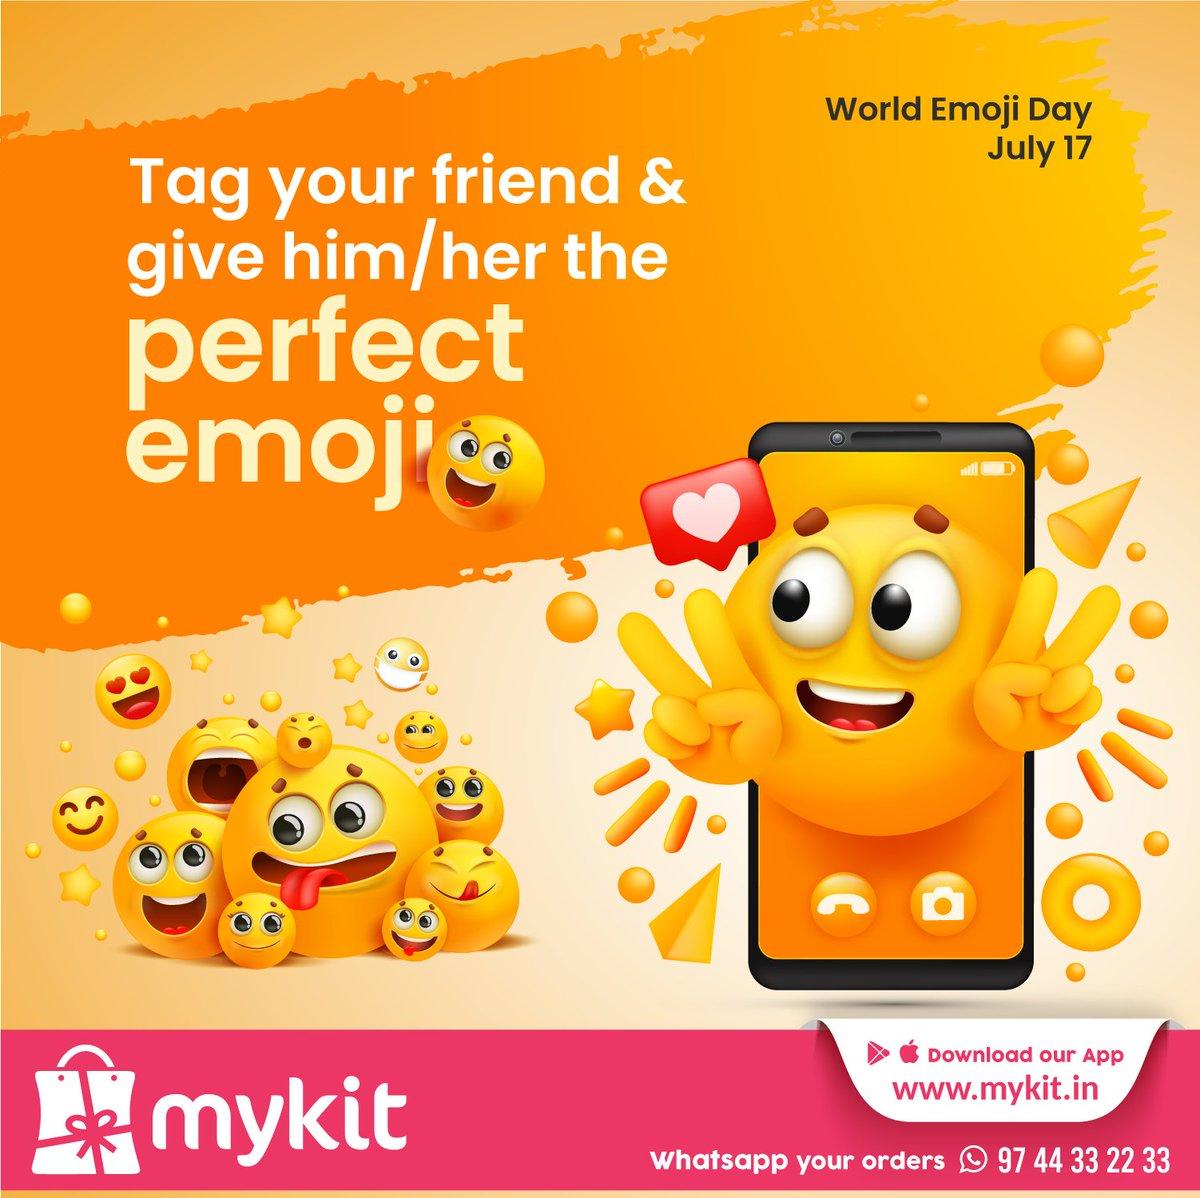 Tag your friend and give him/her the perfect emoji  World Emoji Day July 17  visit now: https://t.co/KjaLi9yPQr  #mykitcart #mykit #worldemojiday #brandyourhome #kannur #kerala https://t.co/0ng29kF8kk